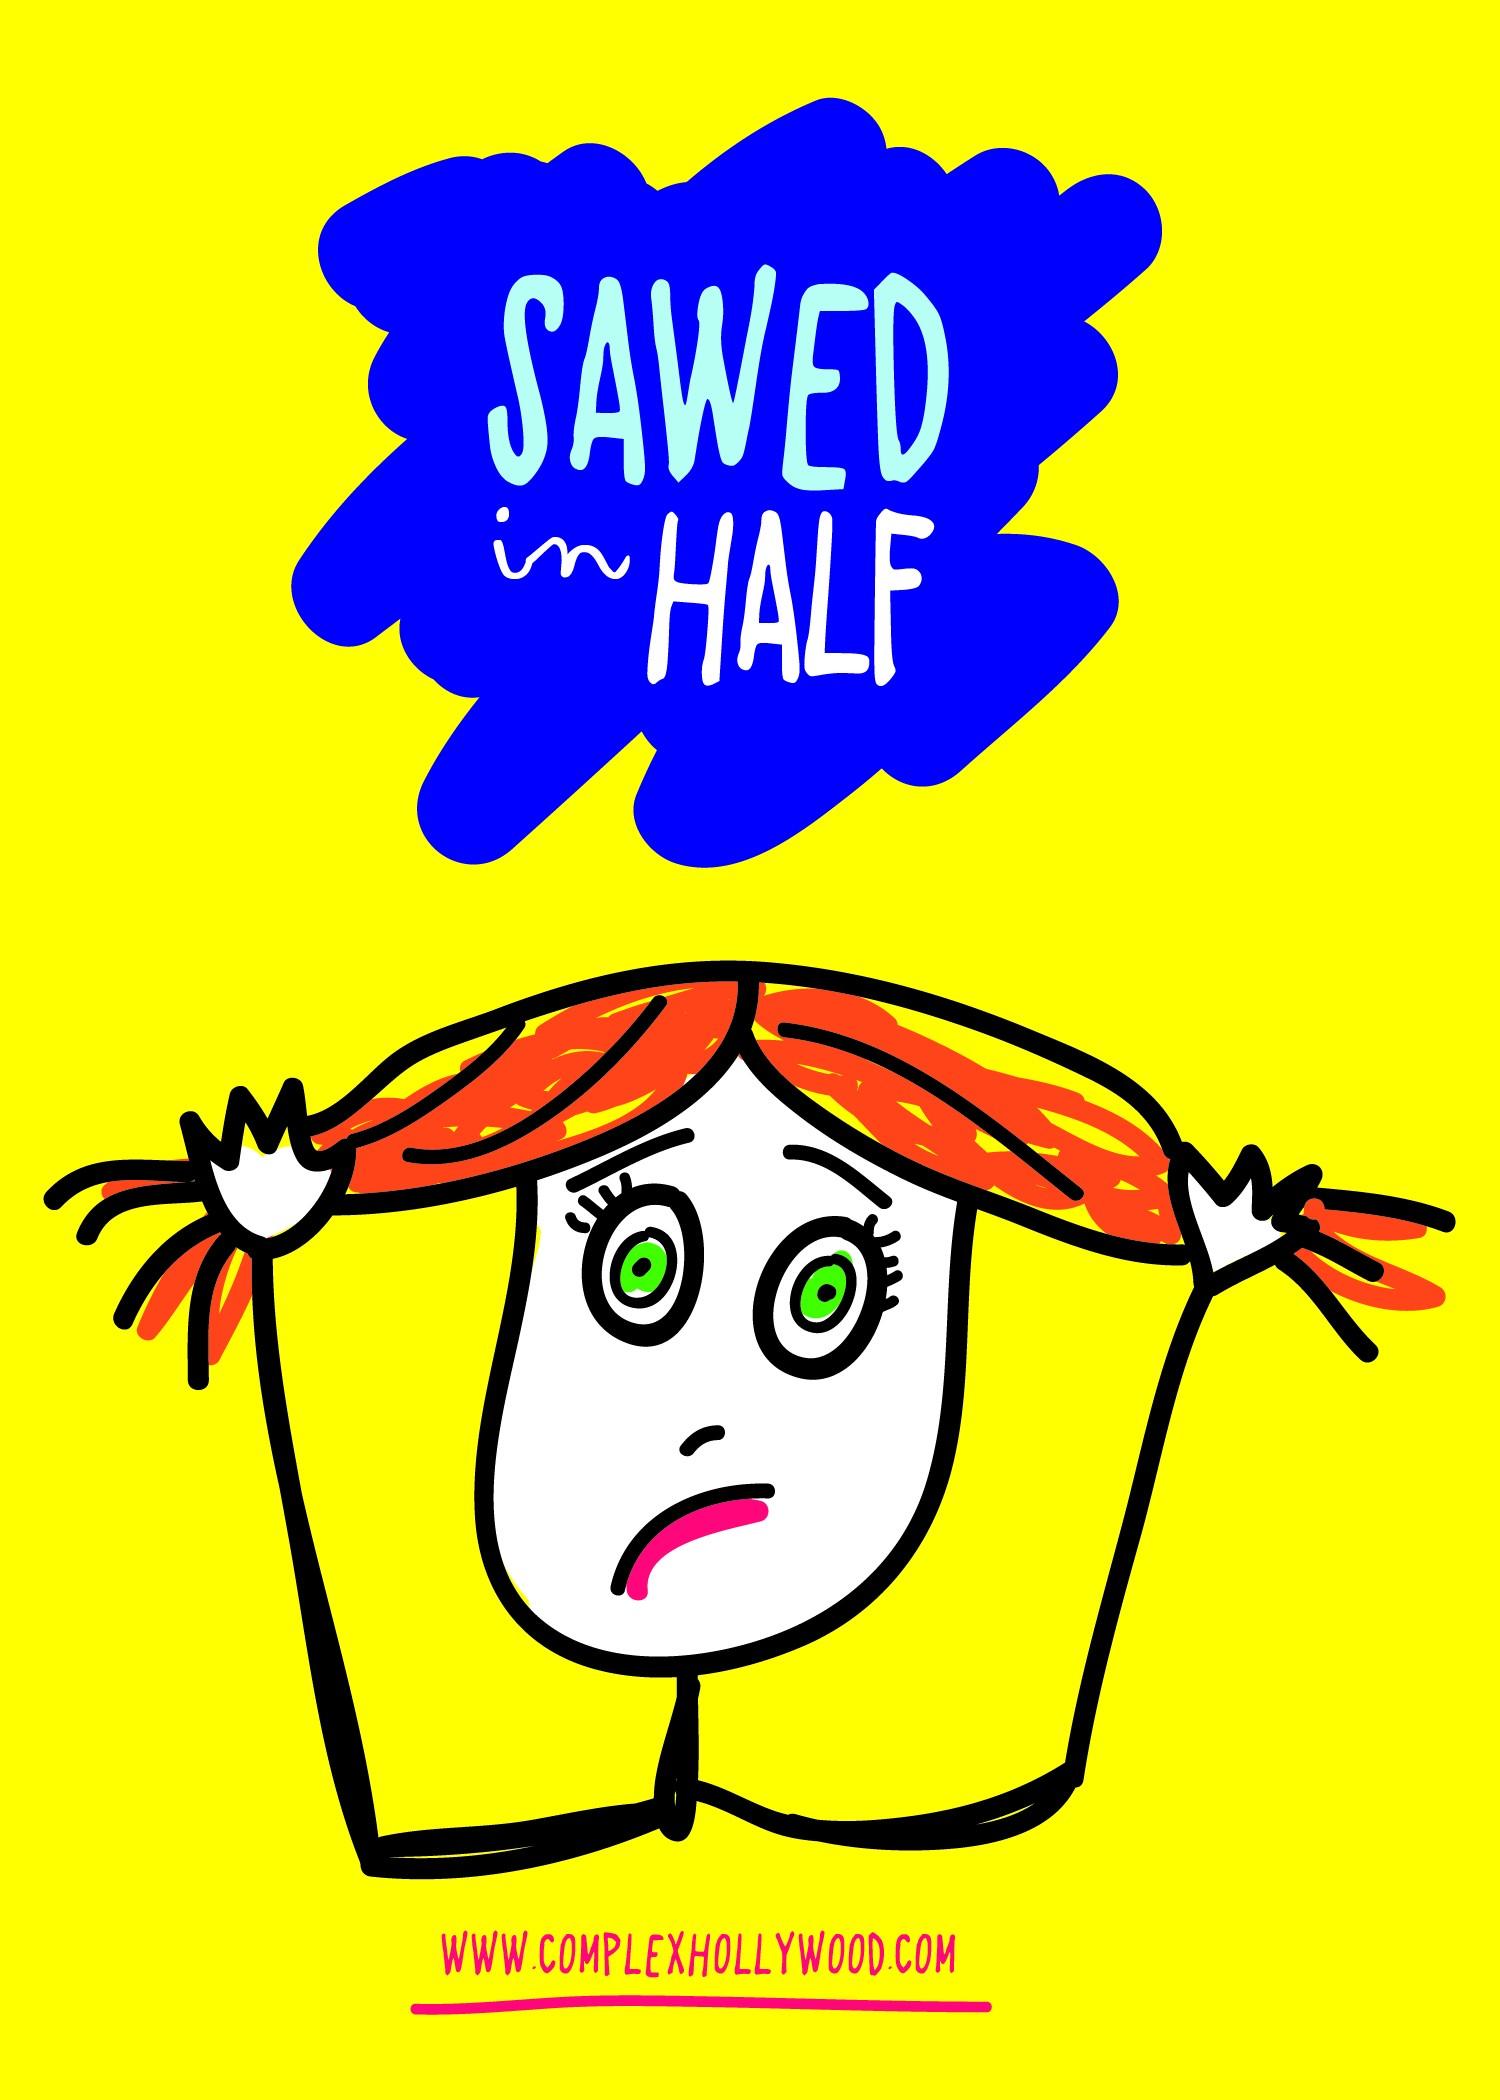 Andrea Mezvinsky -- SAWED IN HALF!